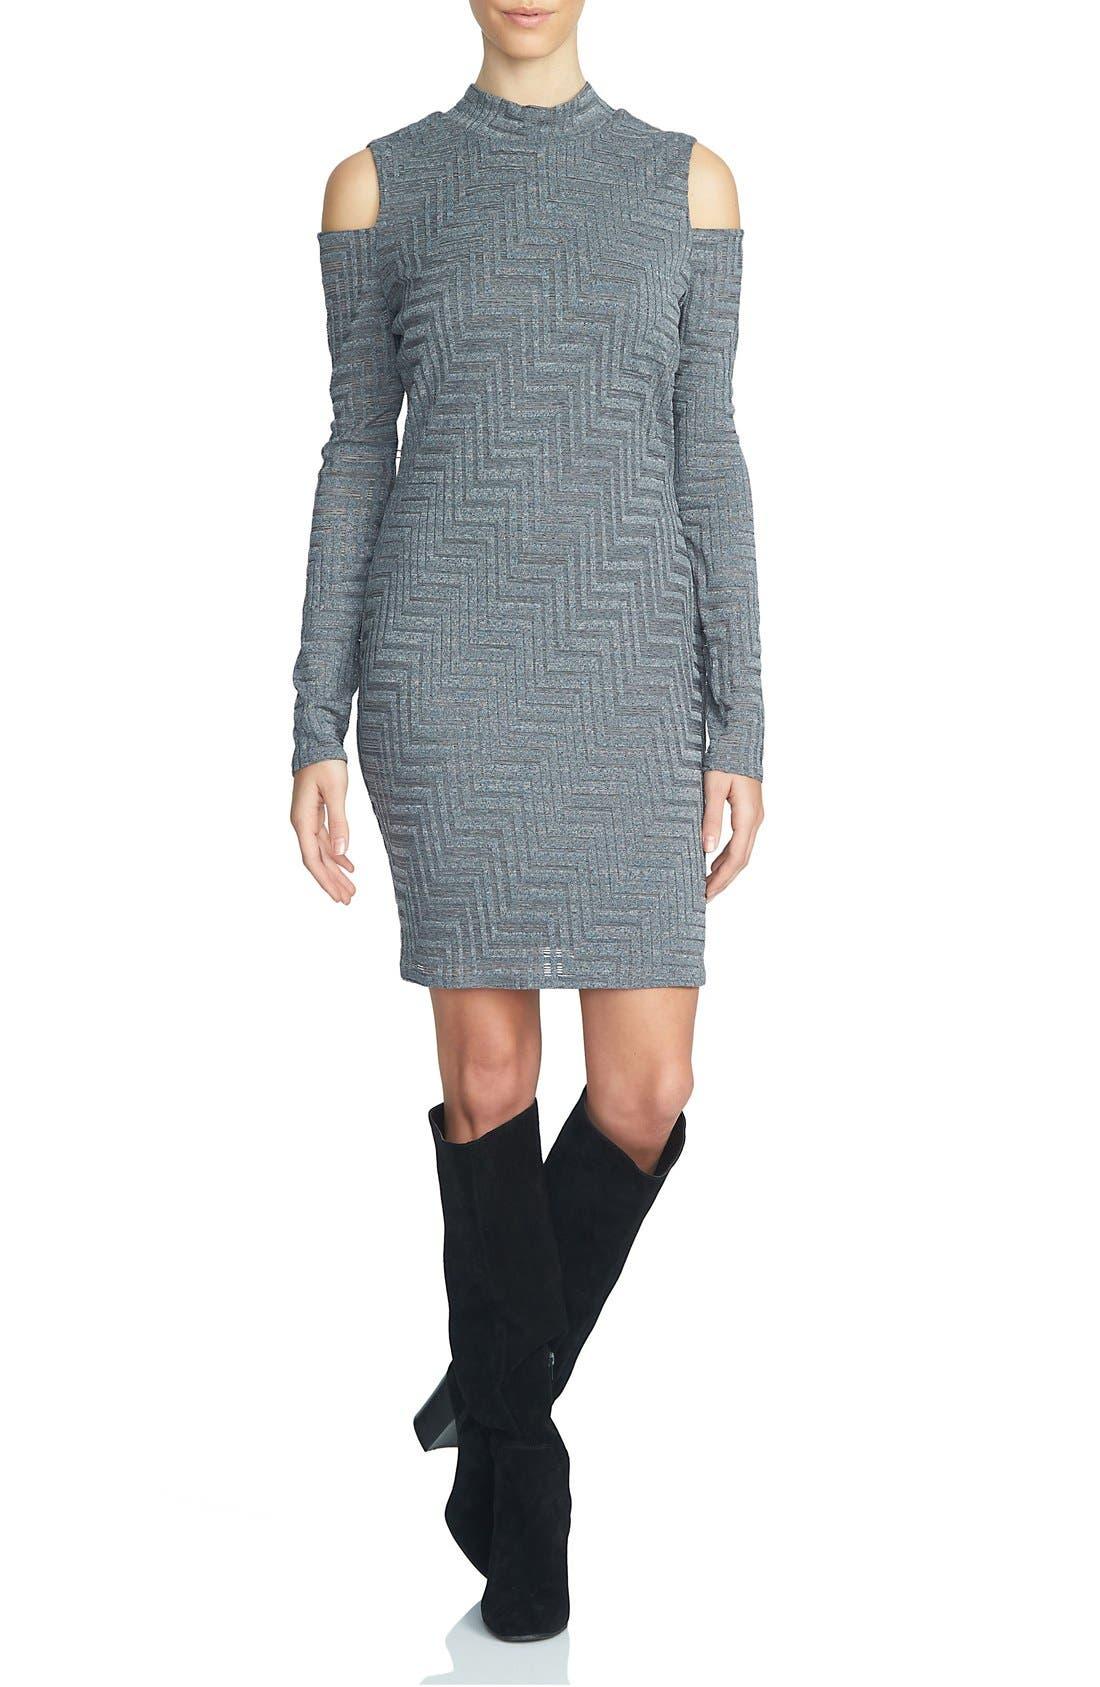 Main Image - 1.STATE Cold Shoulder Sweater Dress